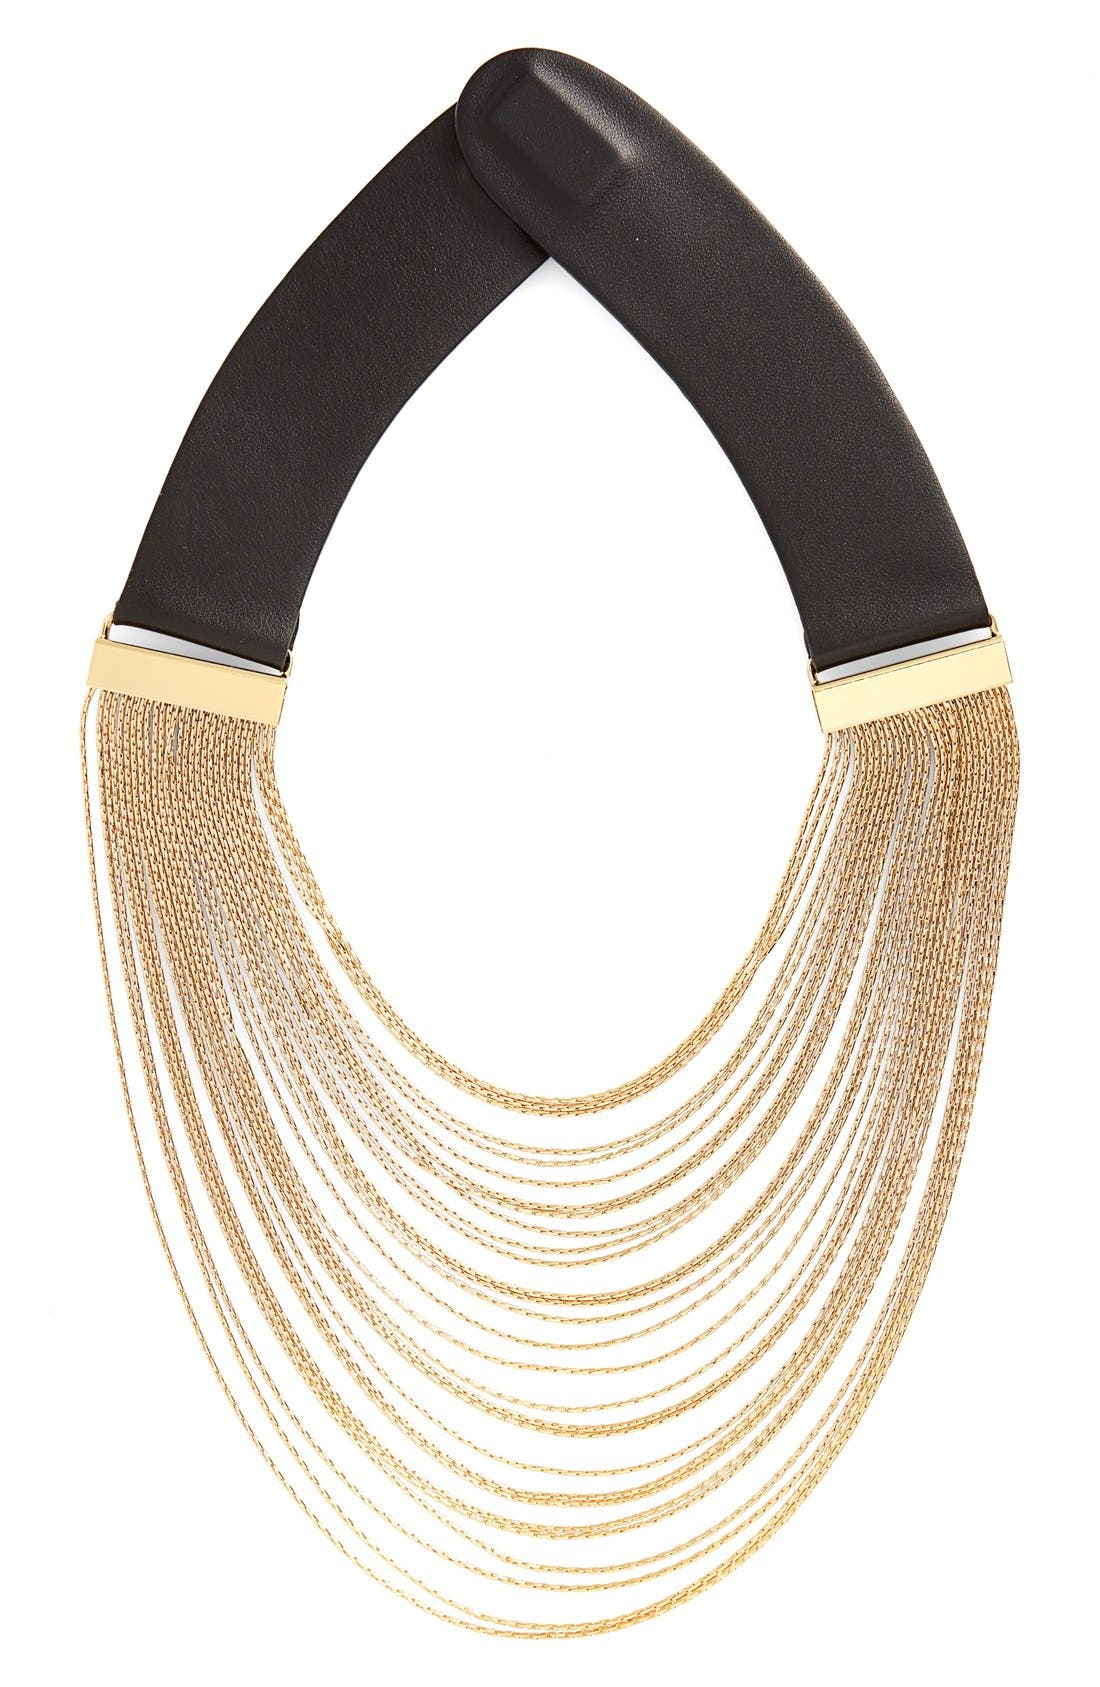 Fairchild Baldwin Multistrand Chain Collar Necklace